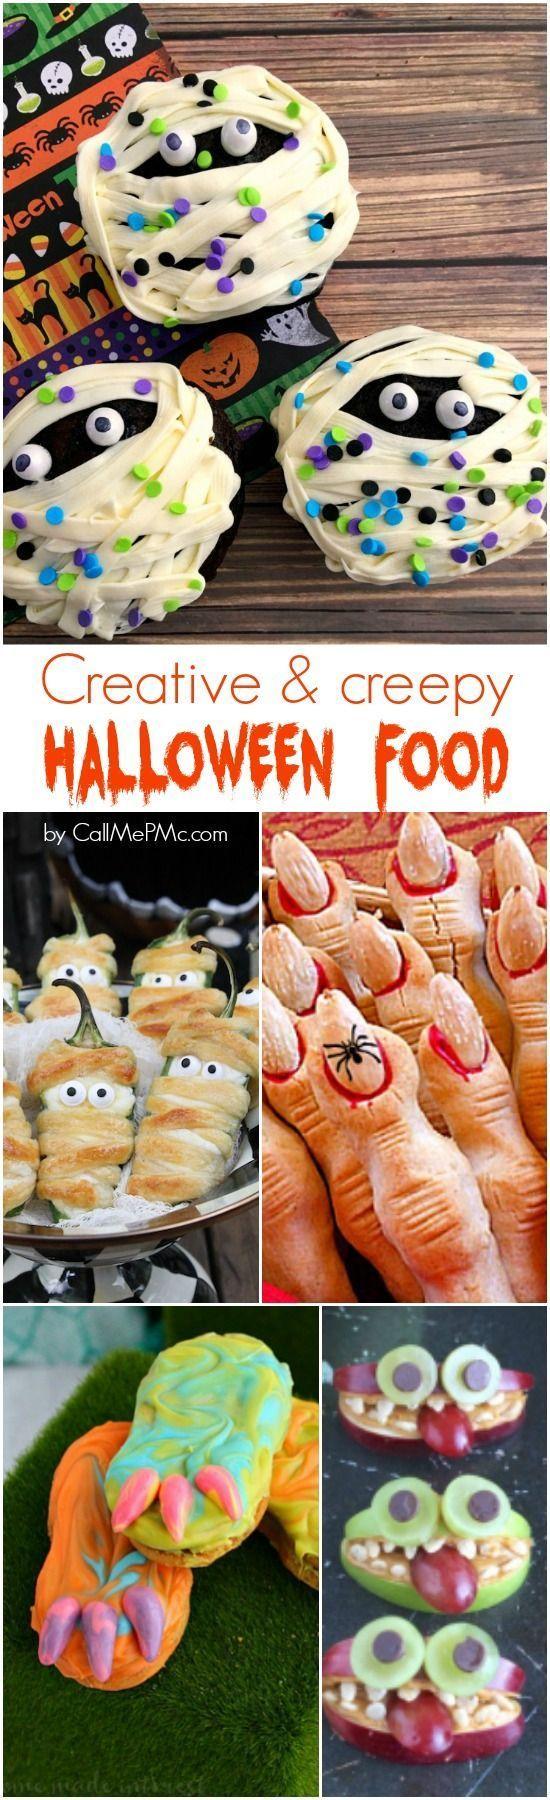 107 best Halloween Food For Kid's images on Pinterest   Meals ...